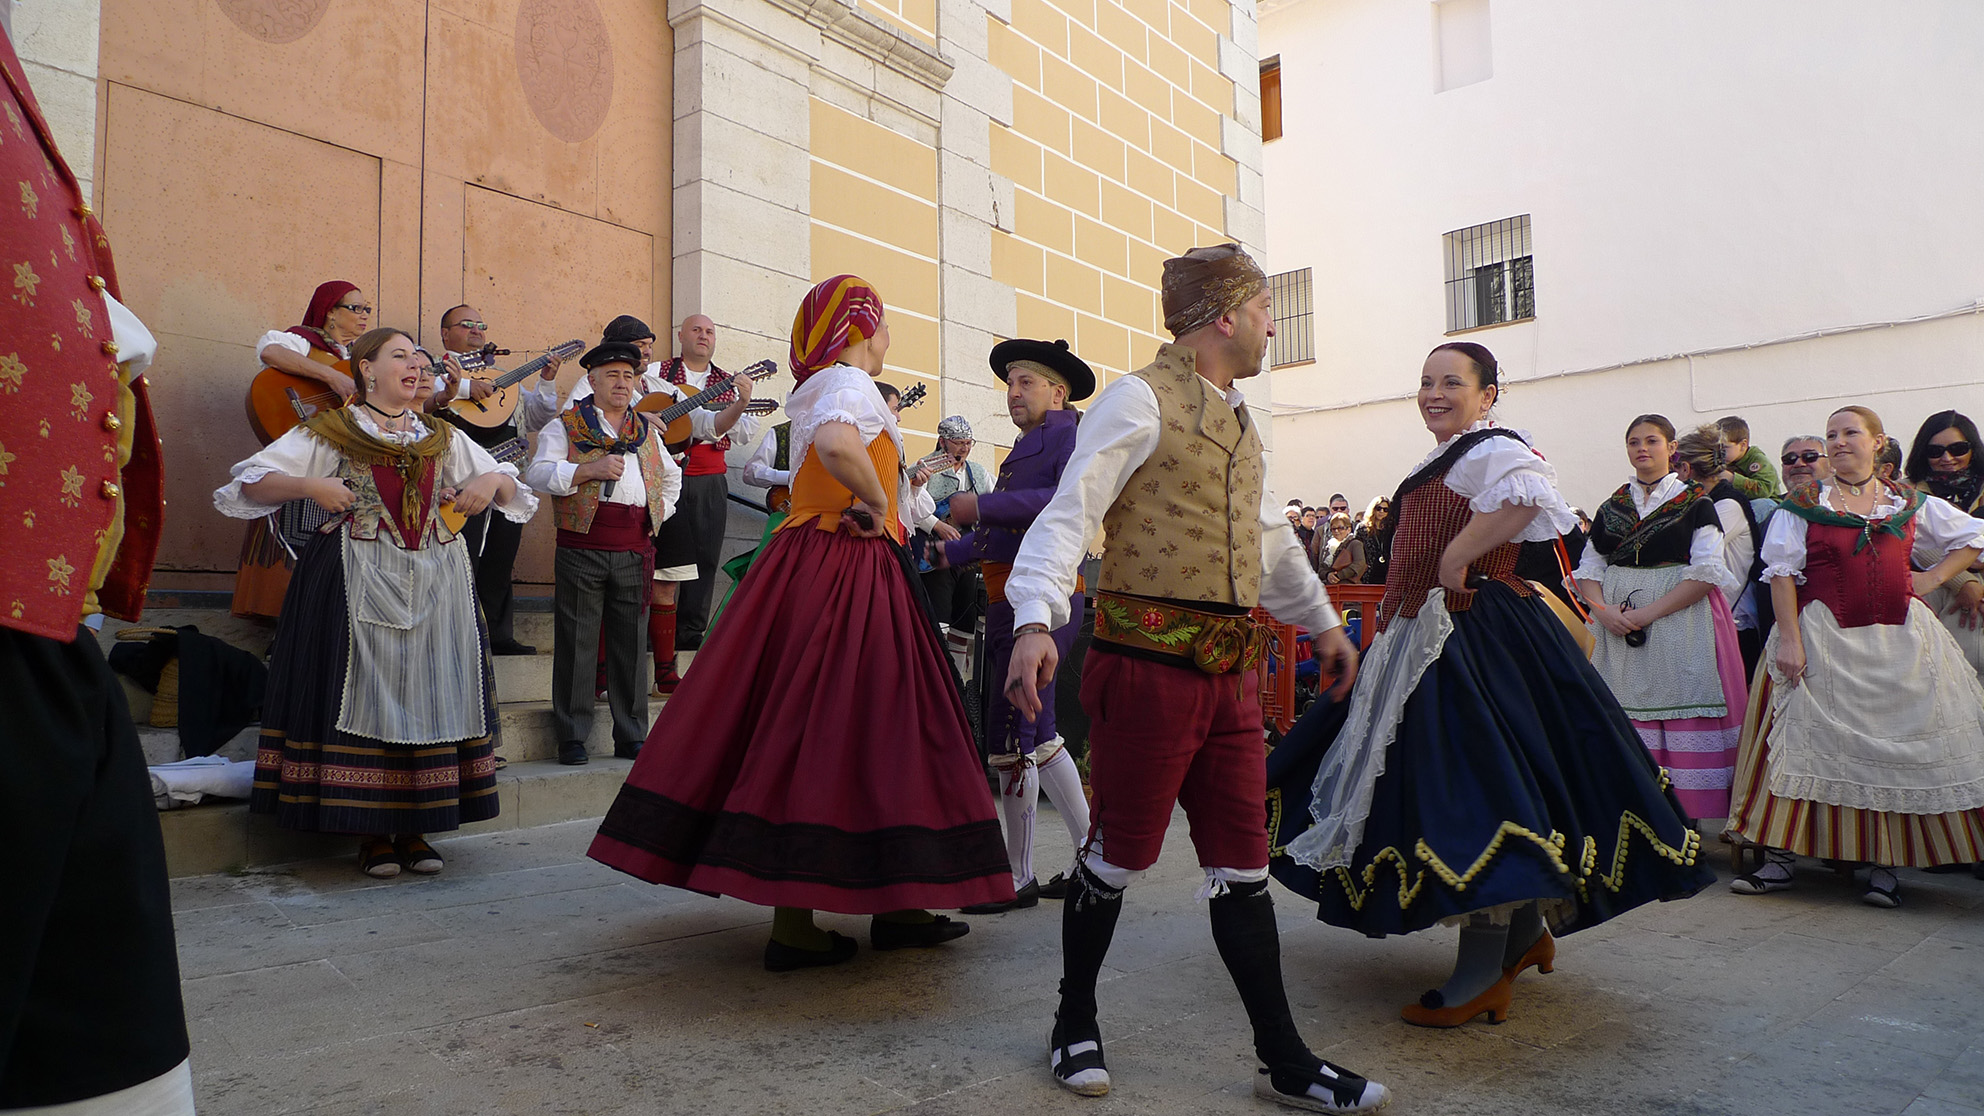 2014-02-23 - Baladre a Fira St. Marcia-ROTOVA (26)